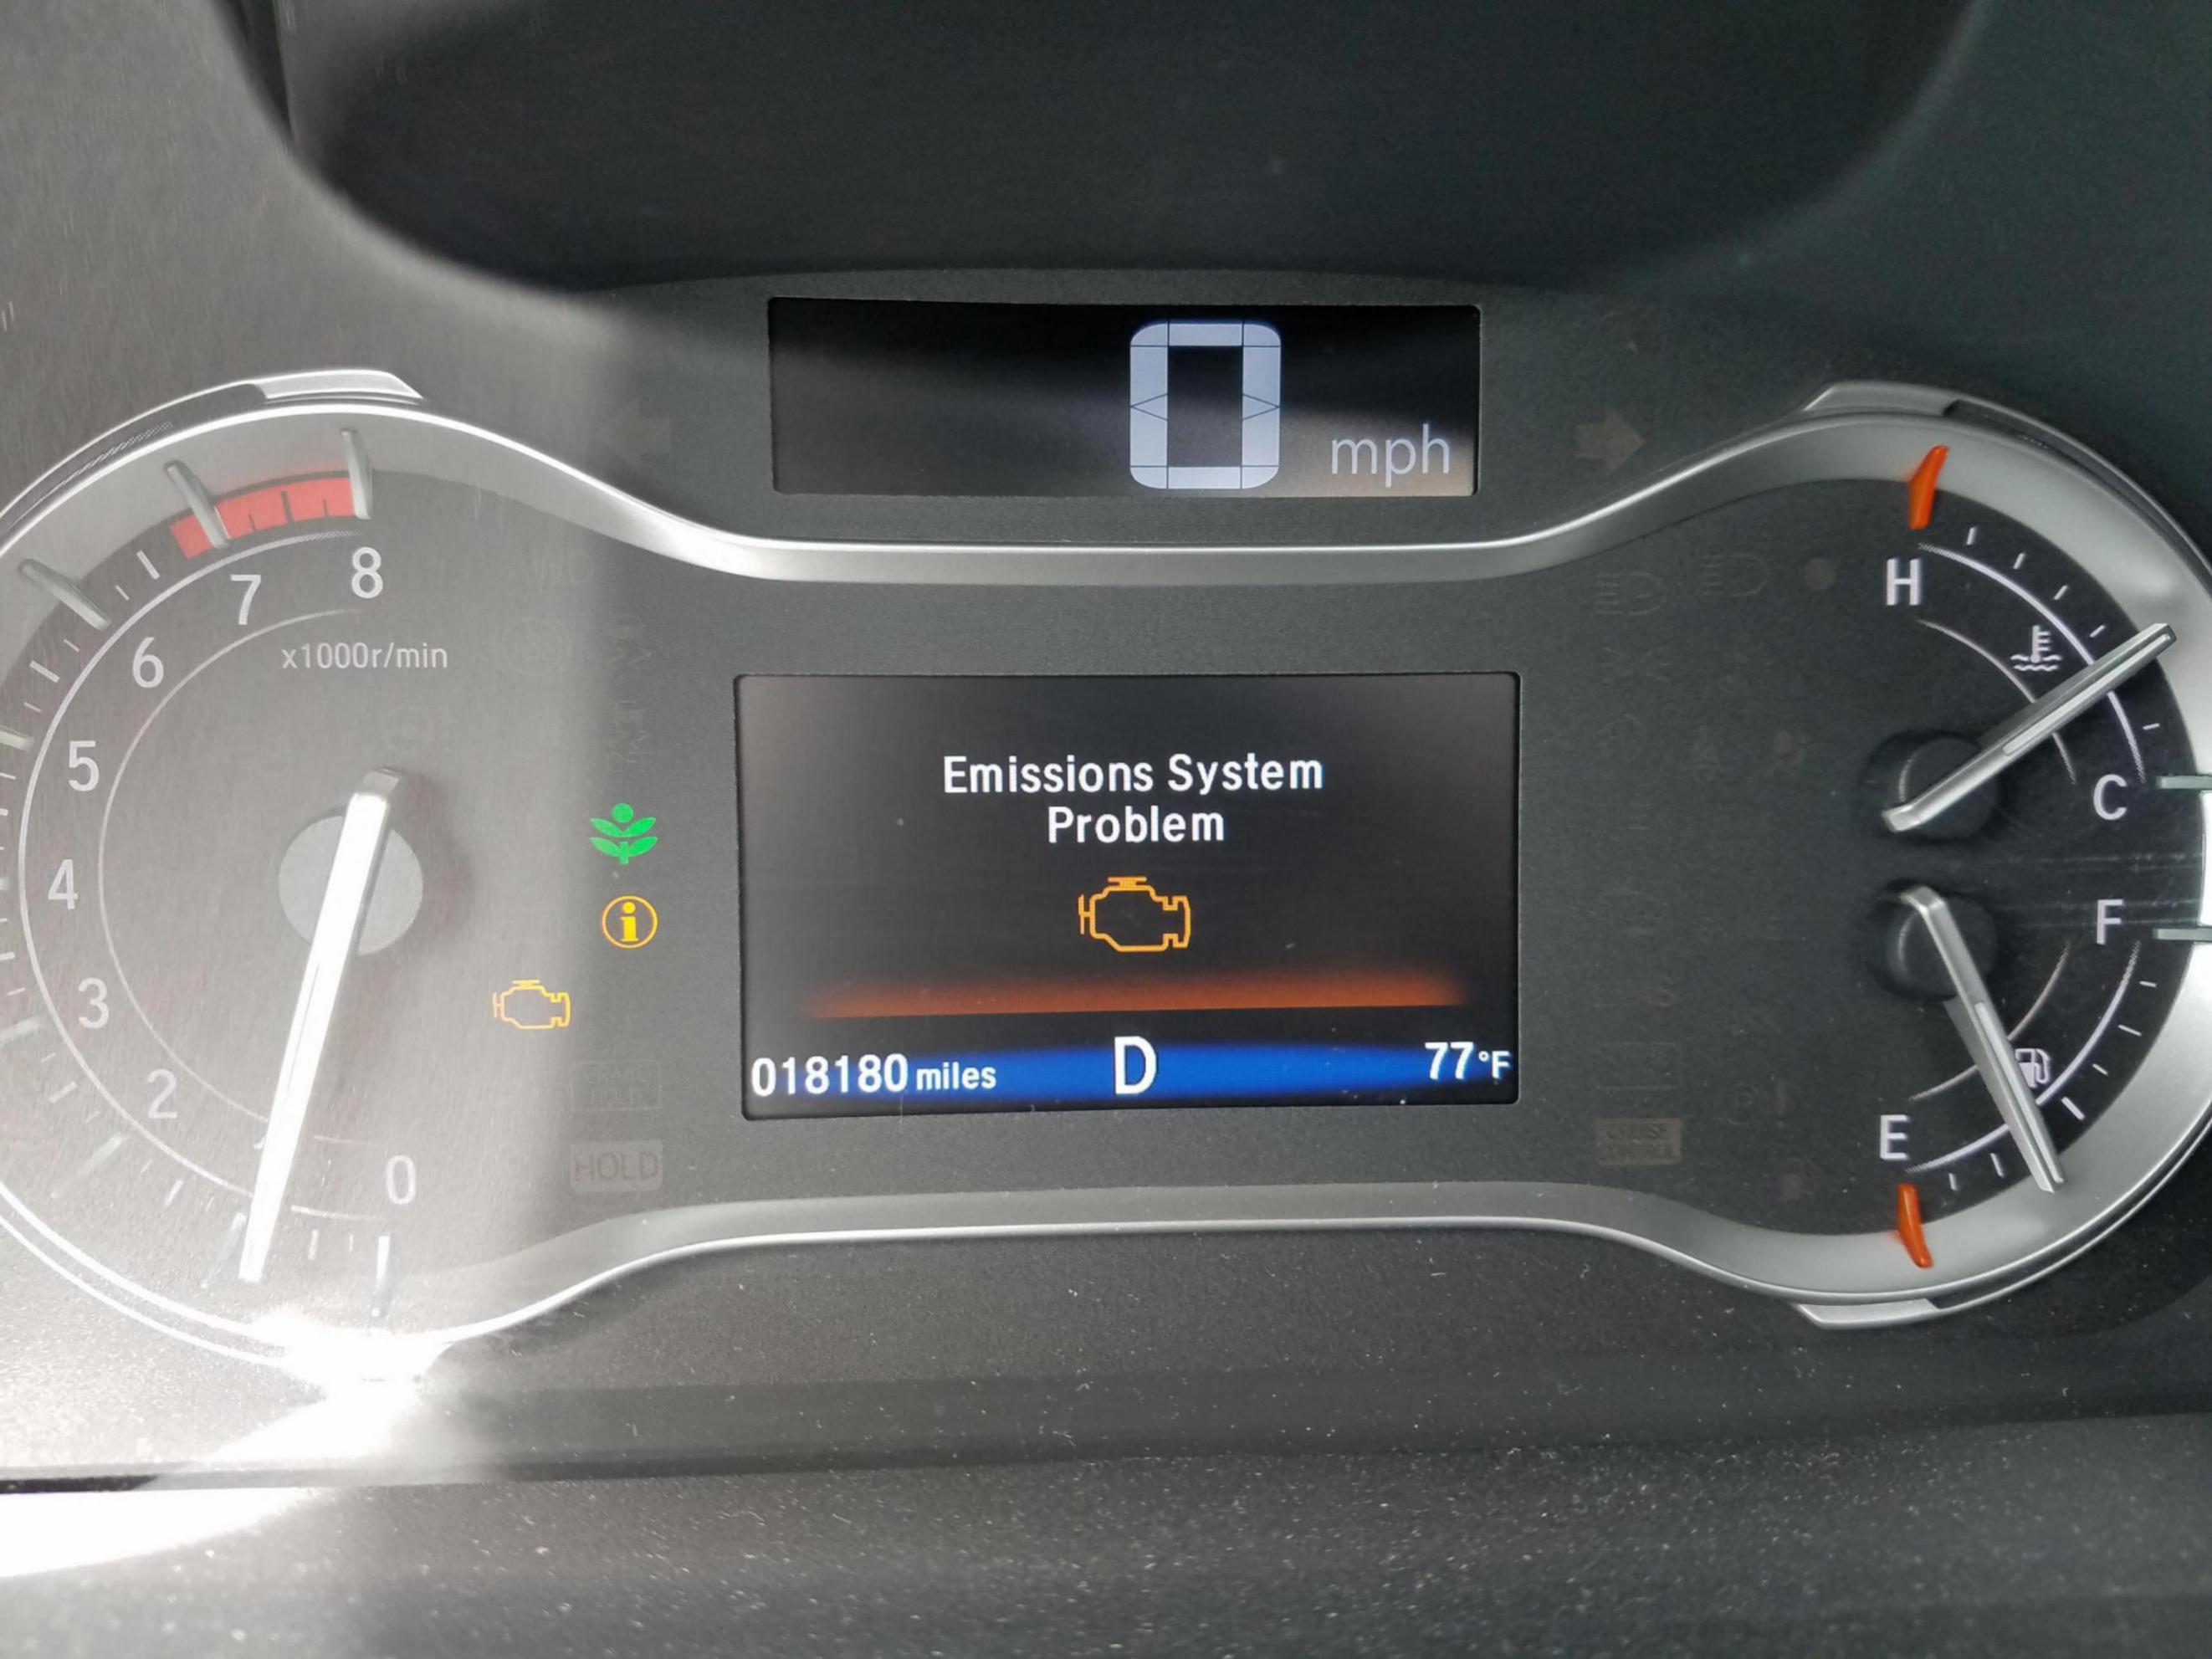 Emissions System Problem Again  Honda Pilot  Honda Pilot Forums